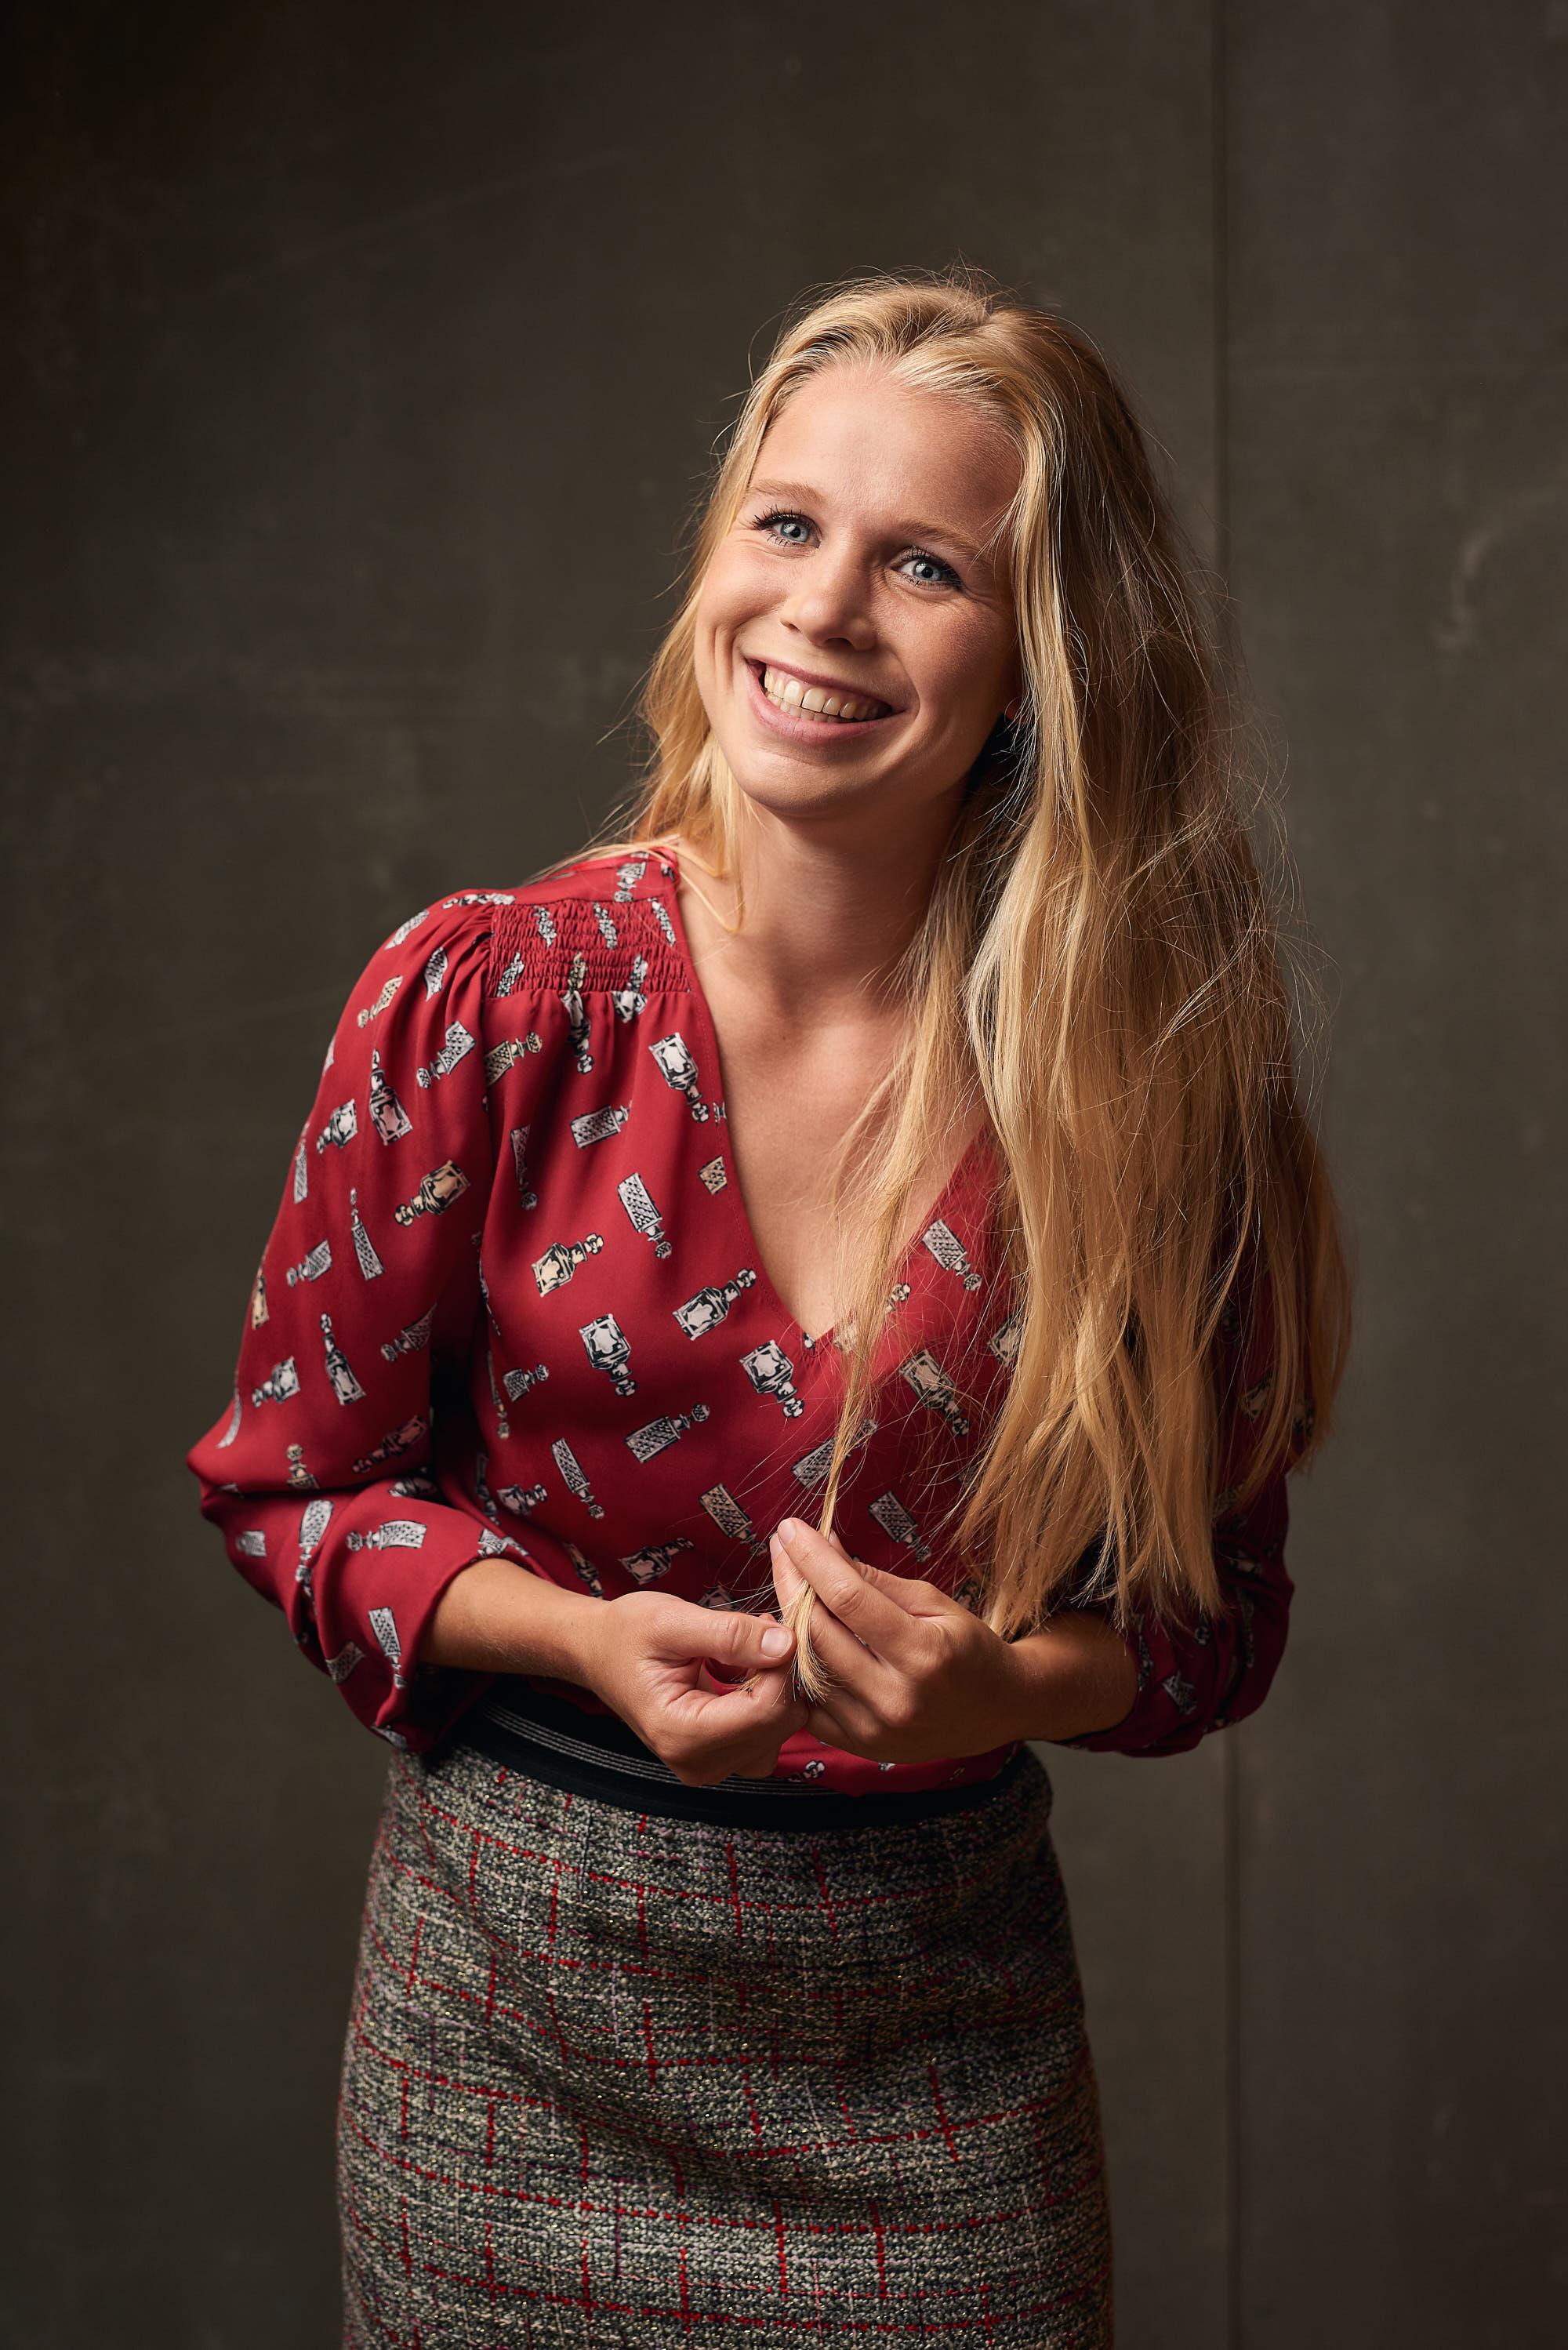 Portrait of Kika van Es for Expresso fashion